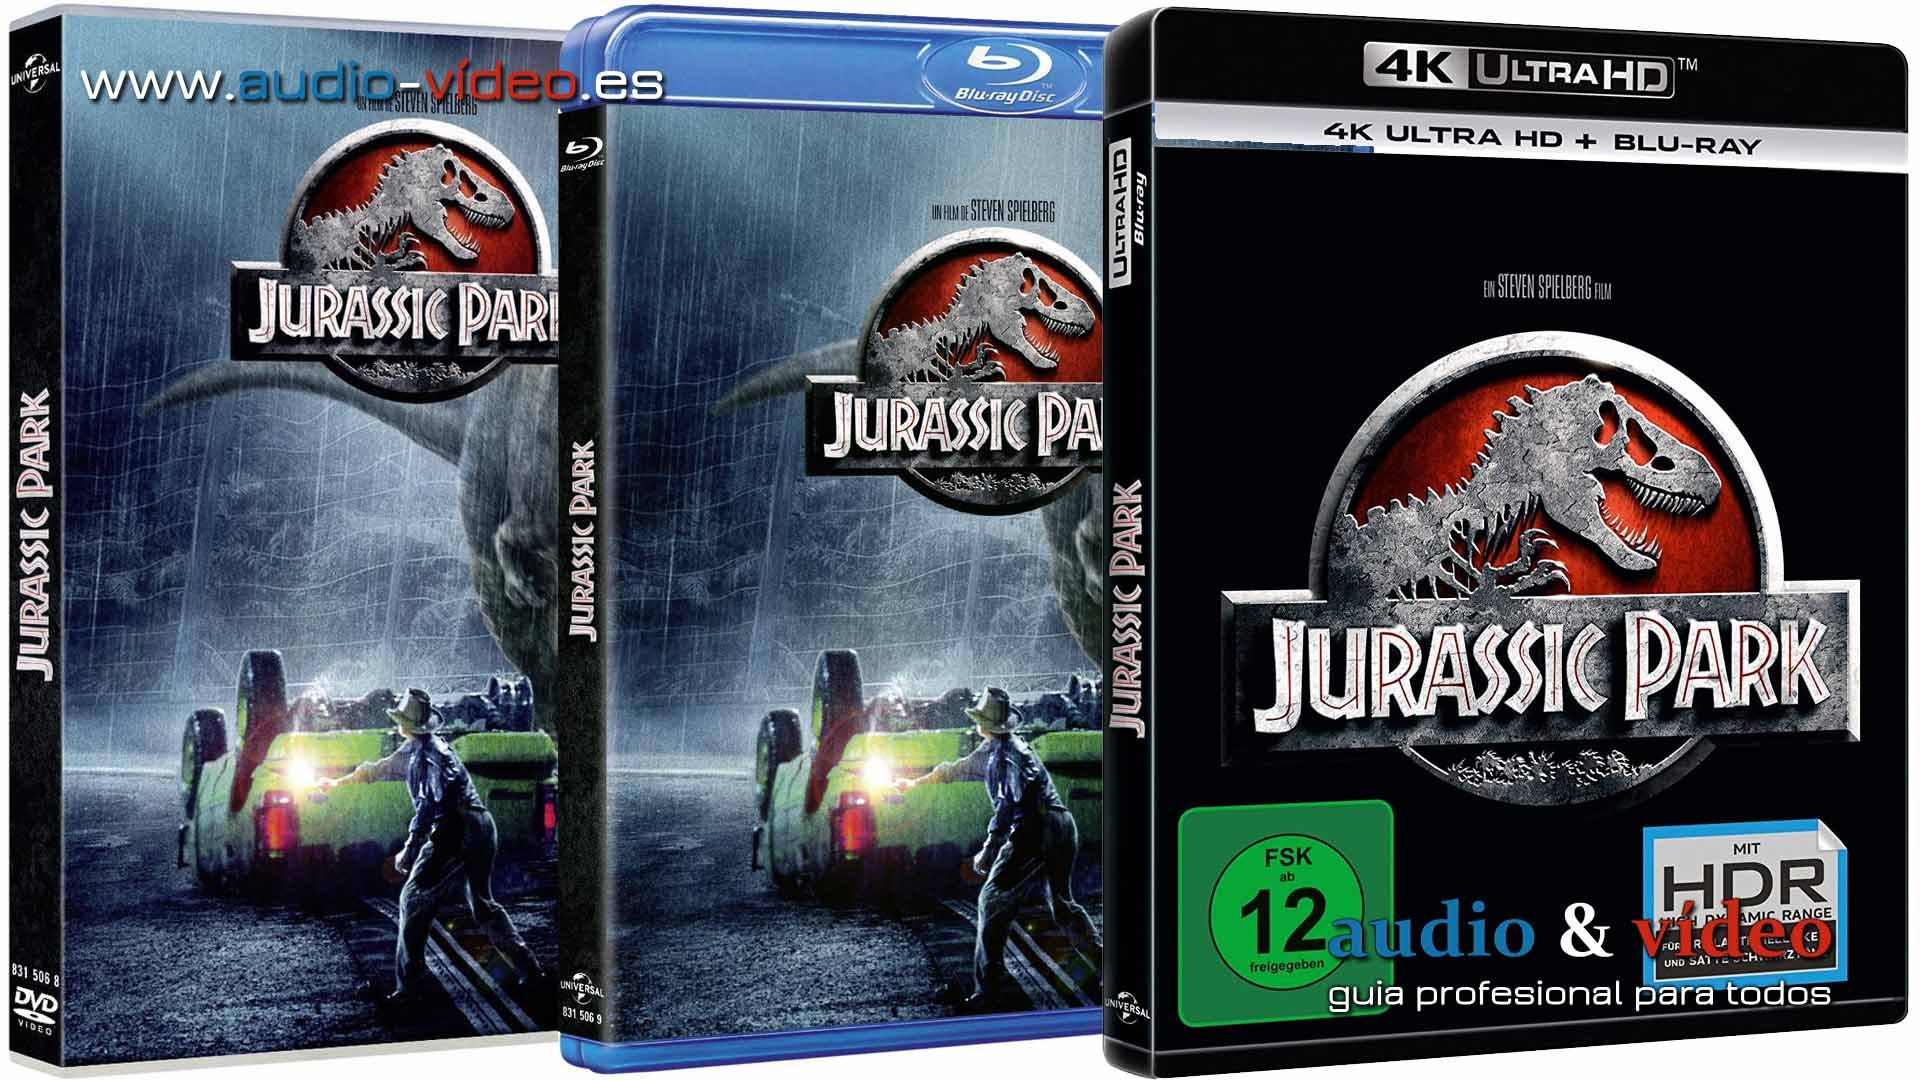 Jurassic Park – 4K, UHD, 3D, BluRay, DVD, VHS